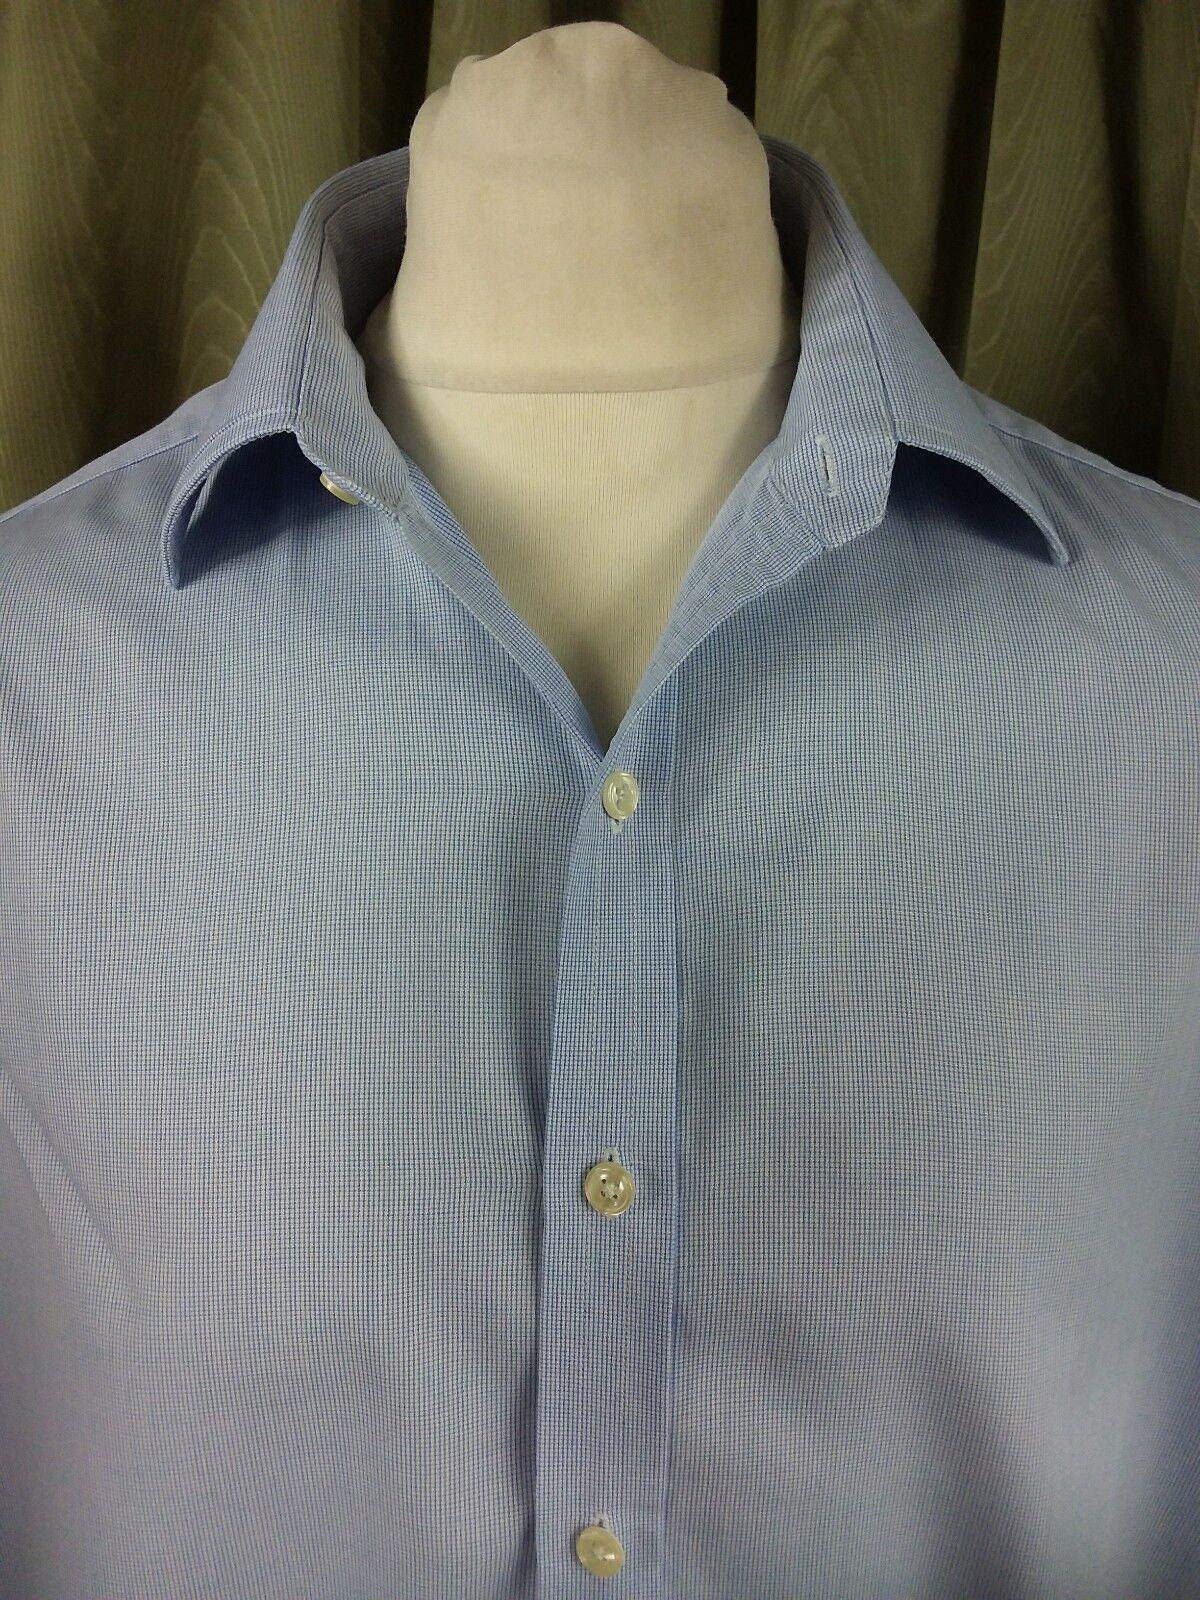 Turnbull & Asser 100% baumwolle Blau Micro Check Double Cuff hemd 16.5  C44